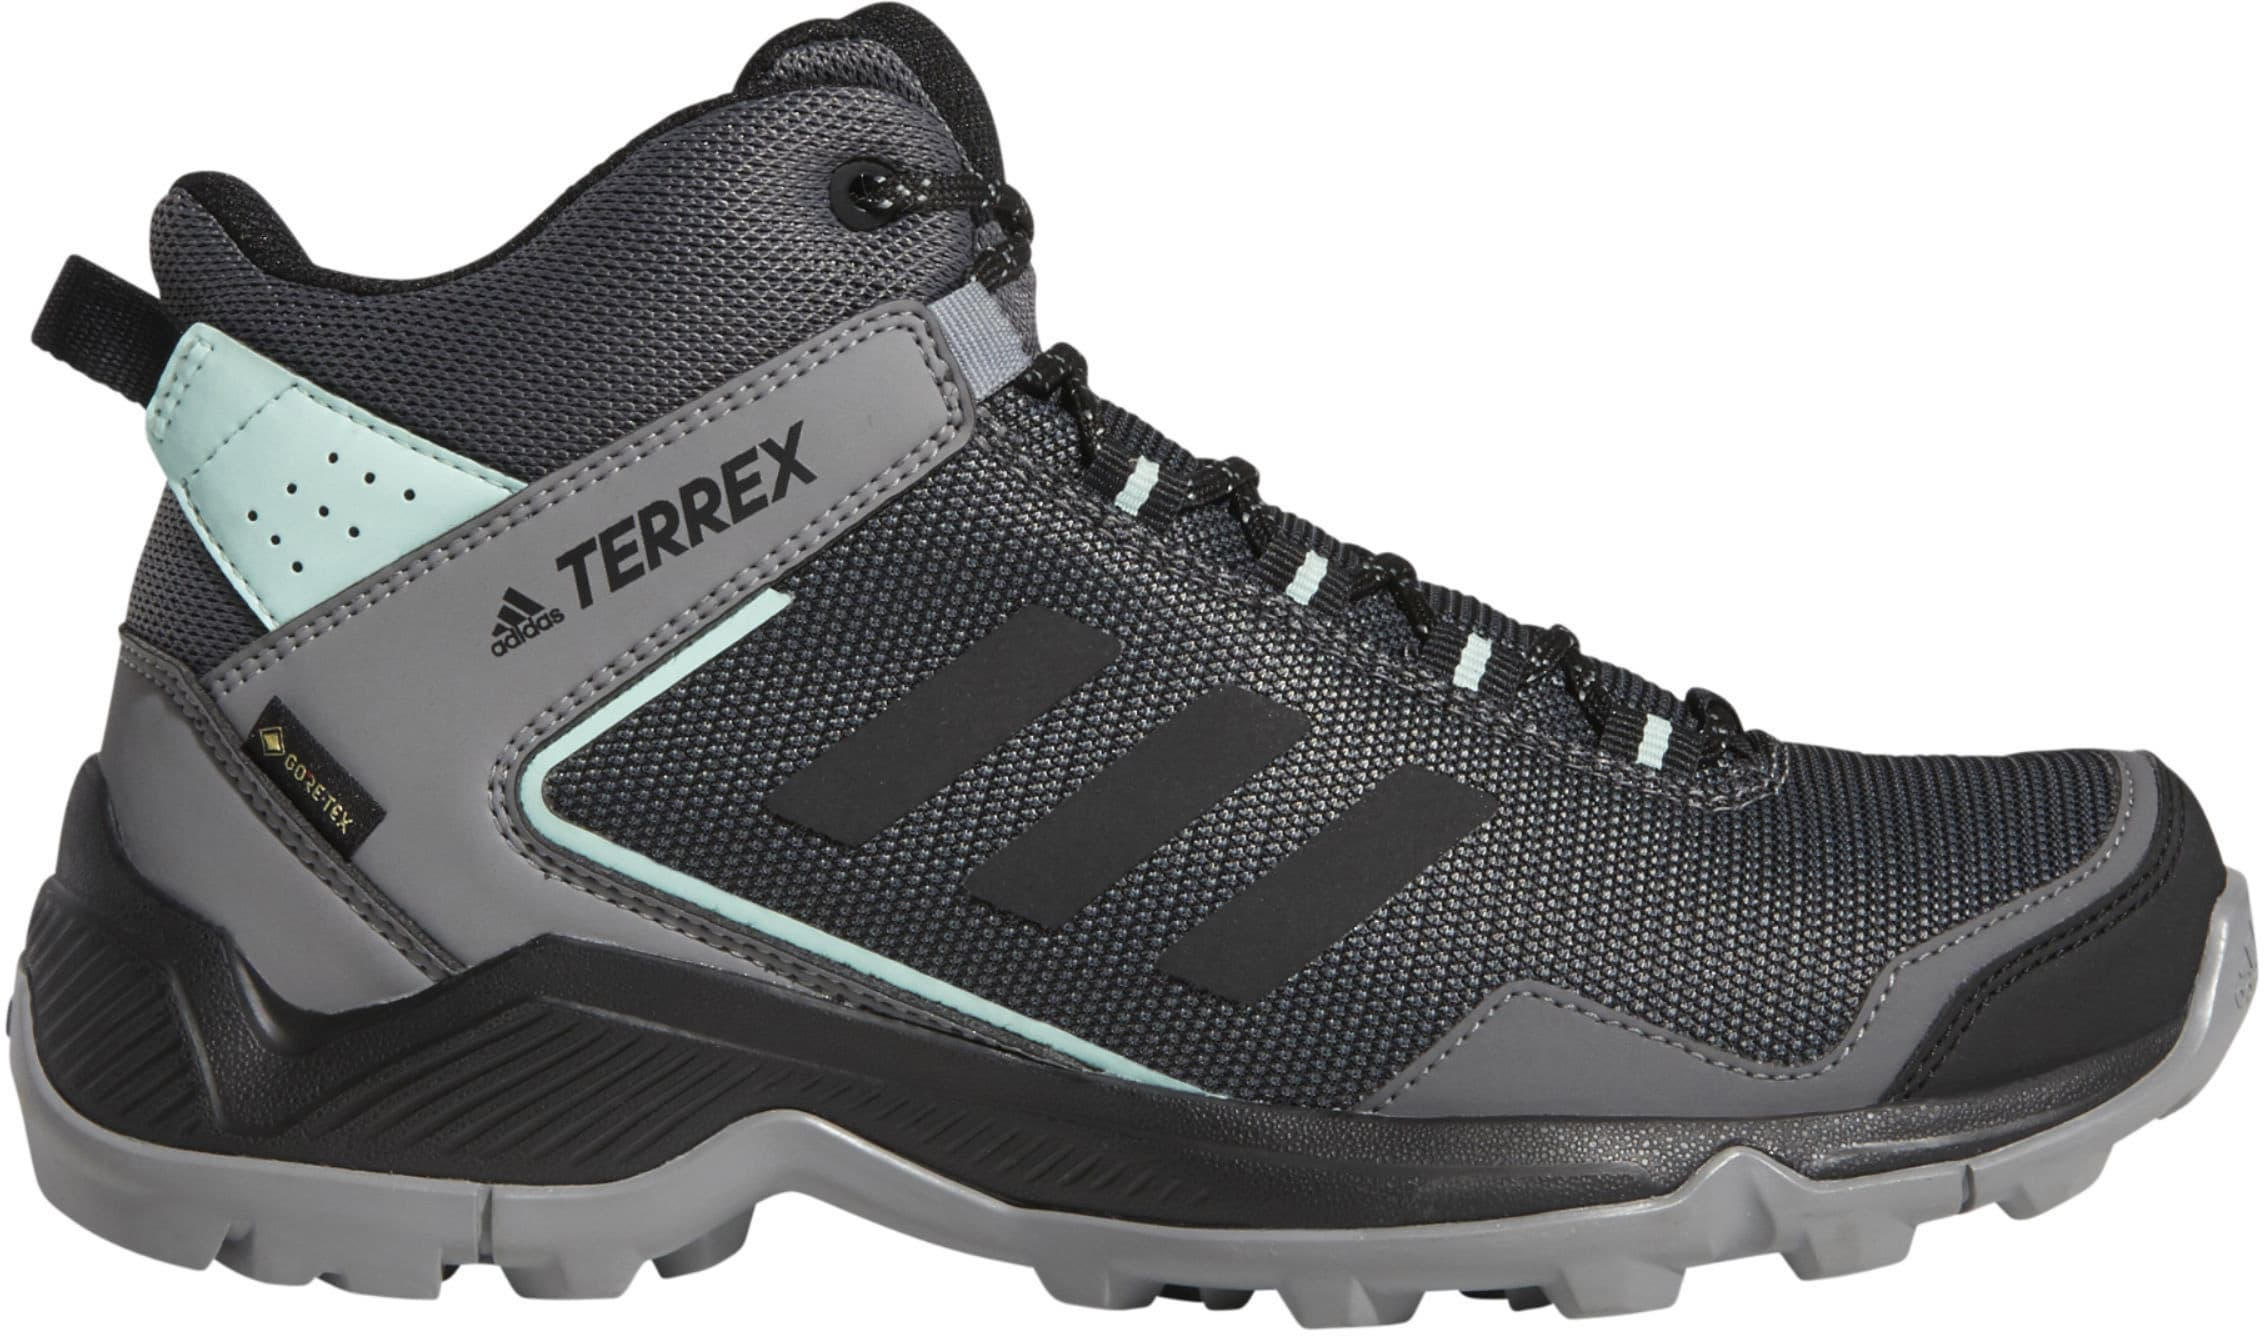 Adidas Terrex Eastrail Mid Gtx Hiking Boots Womens 2019